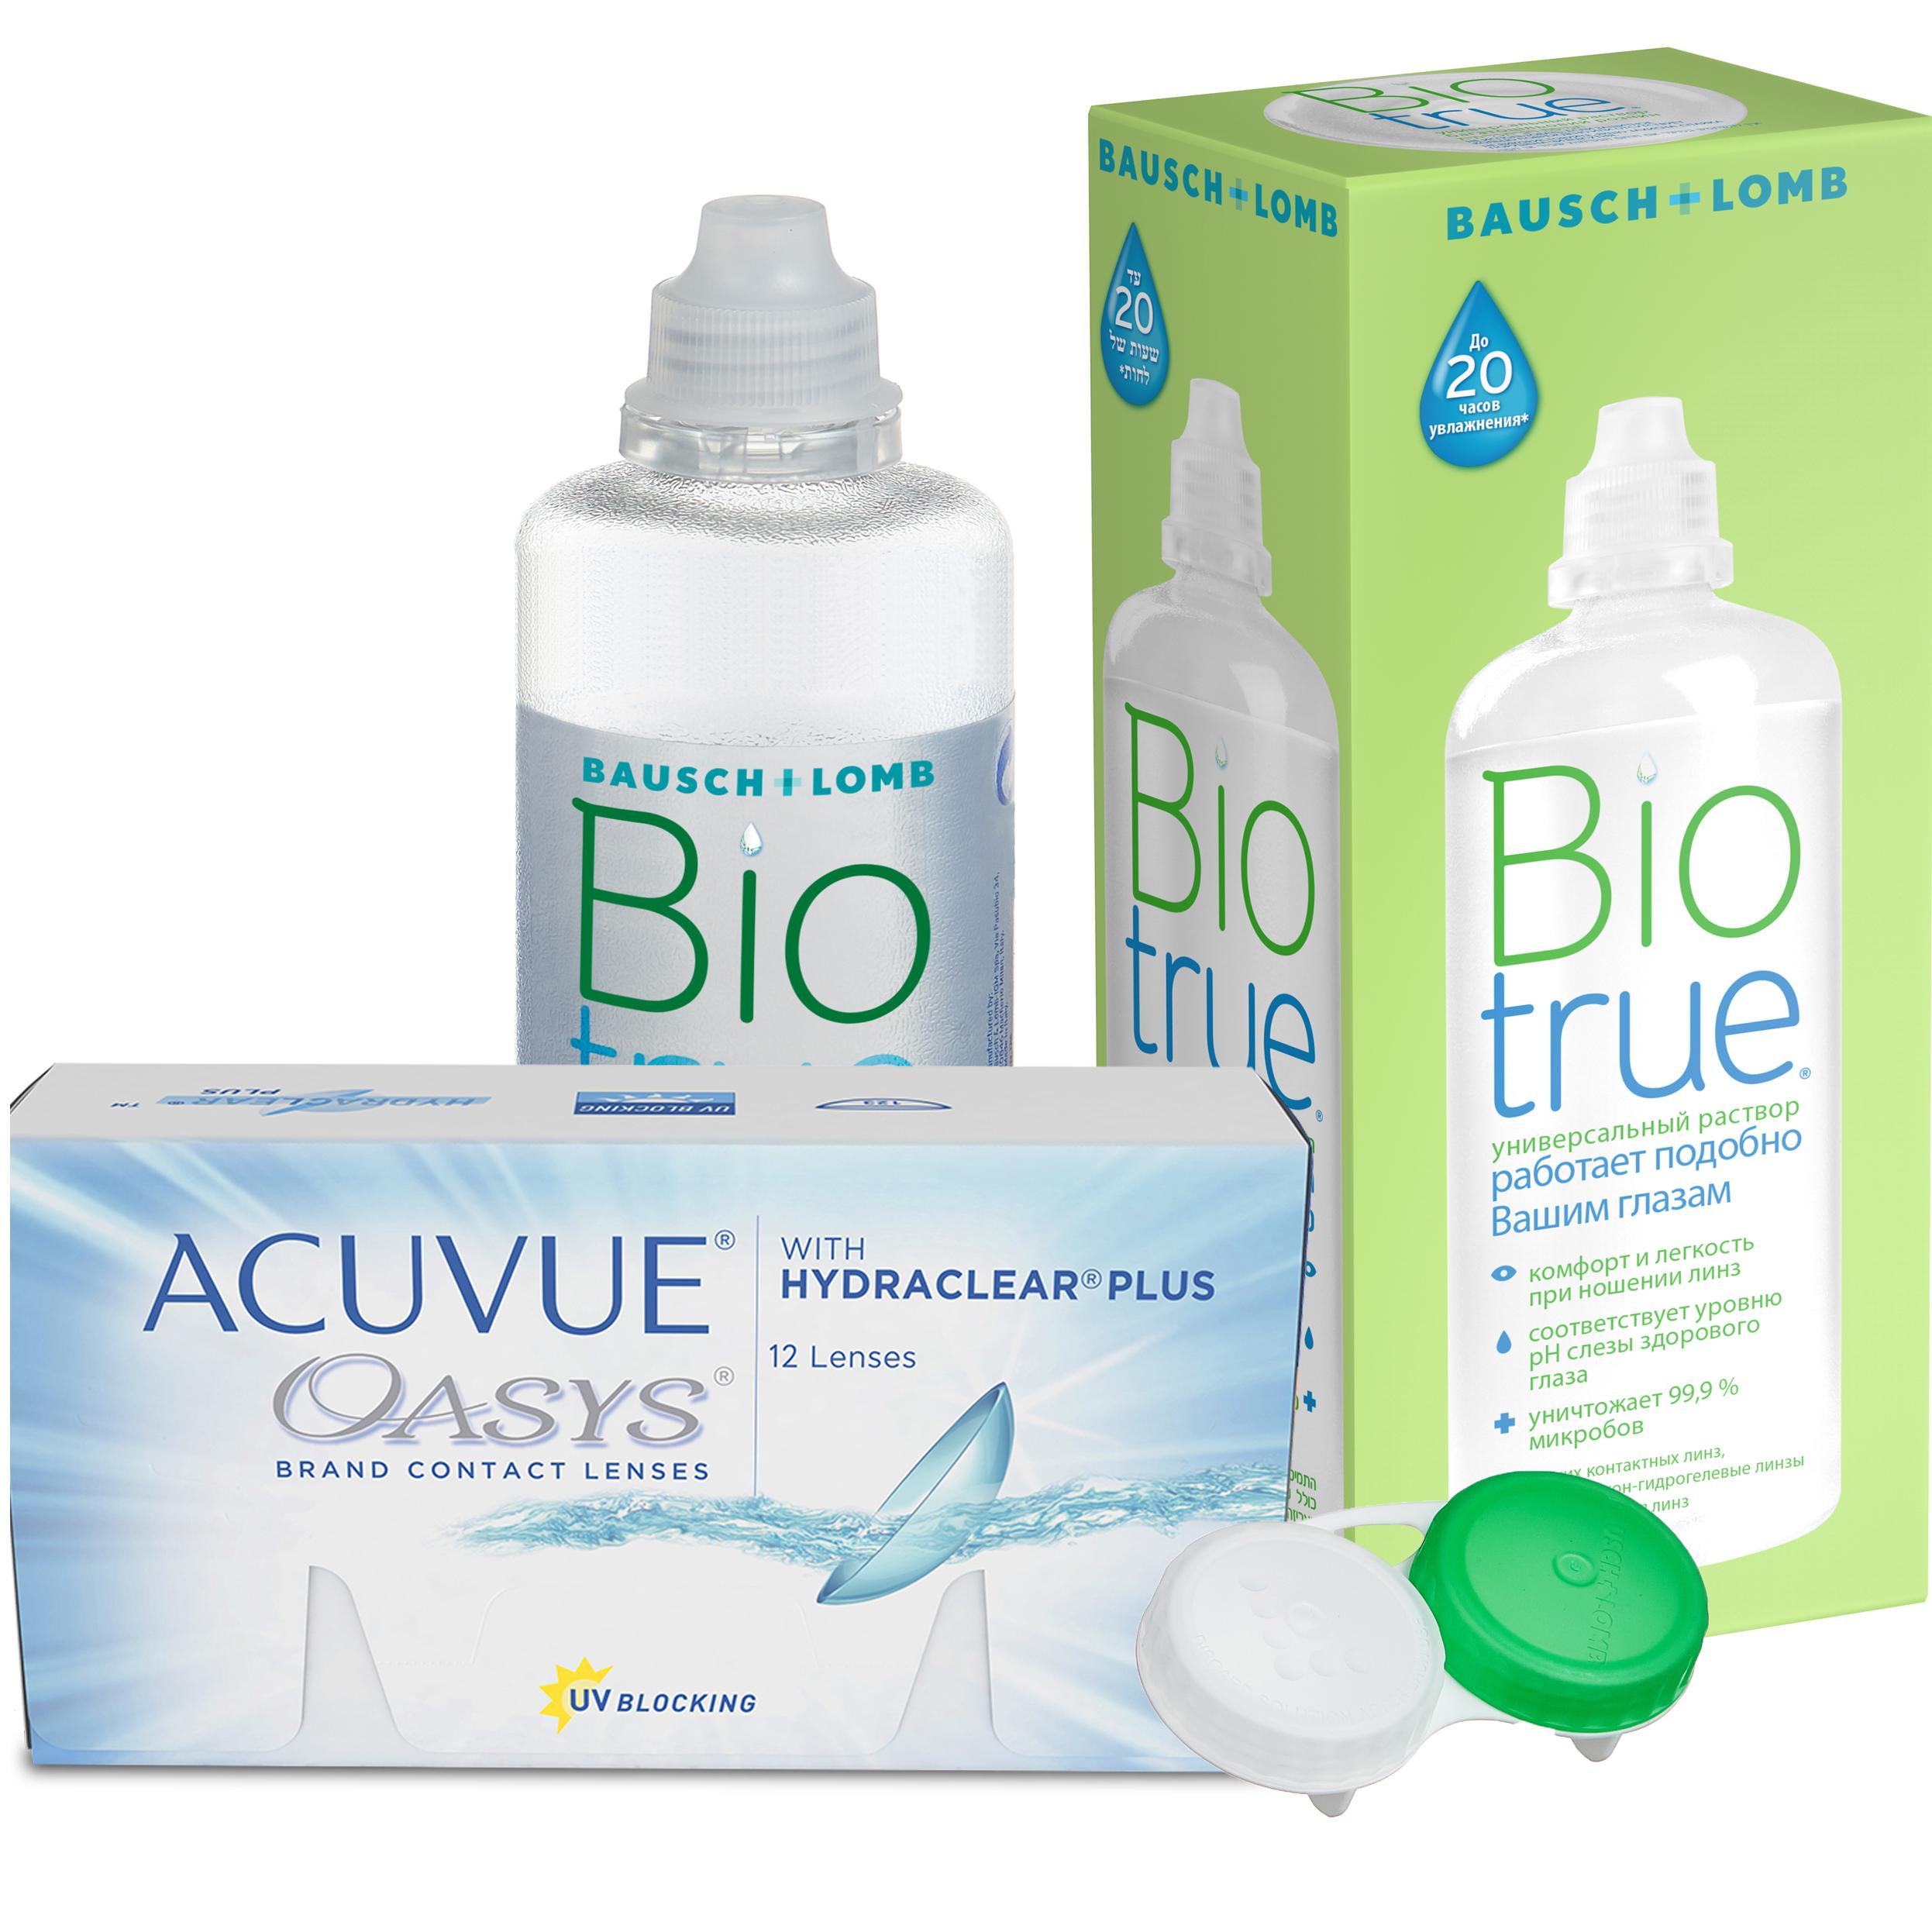 Купить Oasys with Hydraclear Plus 12 линз + Biotrue, Контактные линзы Acuvue Oasys with Hydraclear Plus 12 линз R 8.8 +3, 00 + Biotrue 300 мл